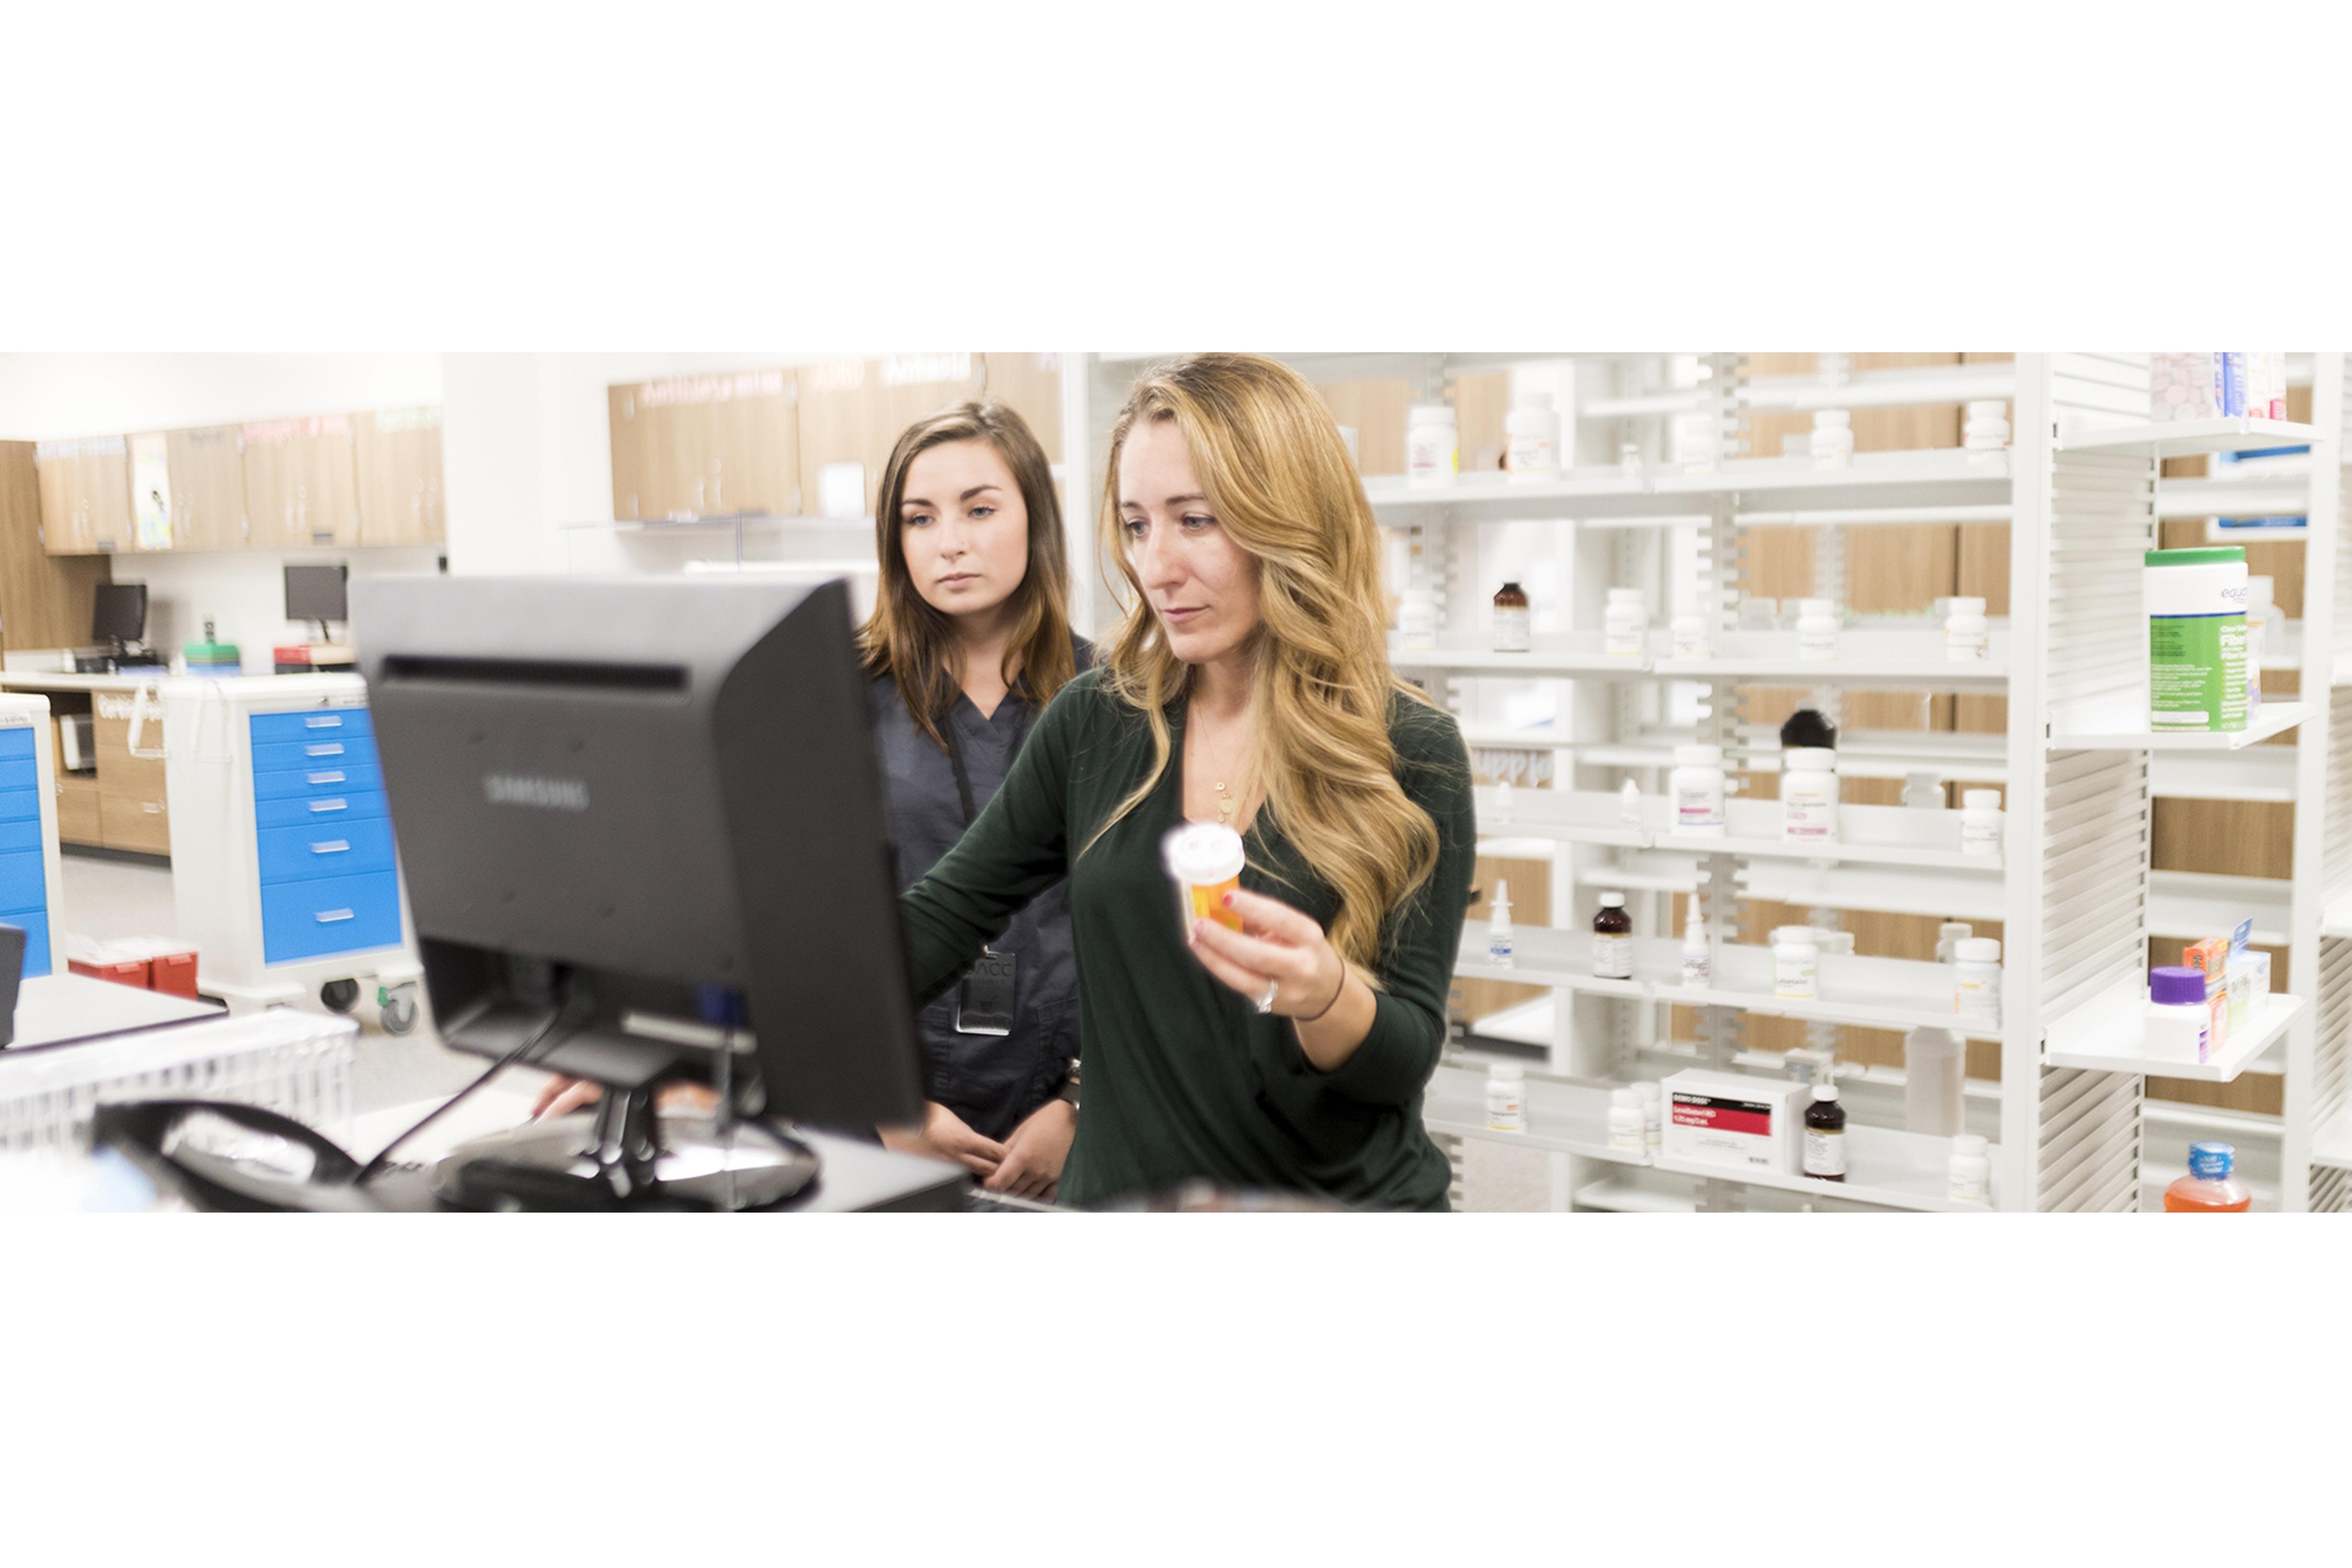 Pharmacy Technician labeling medicines